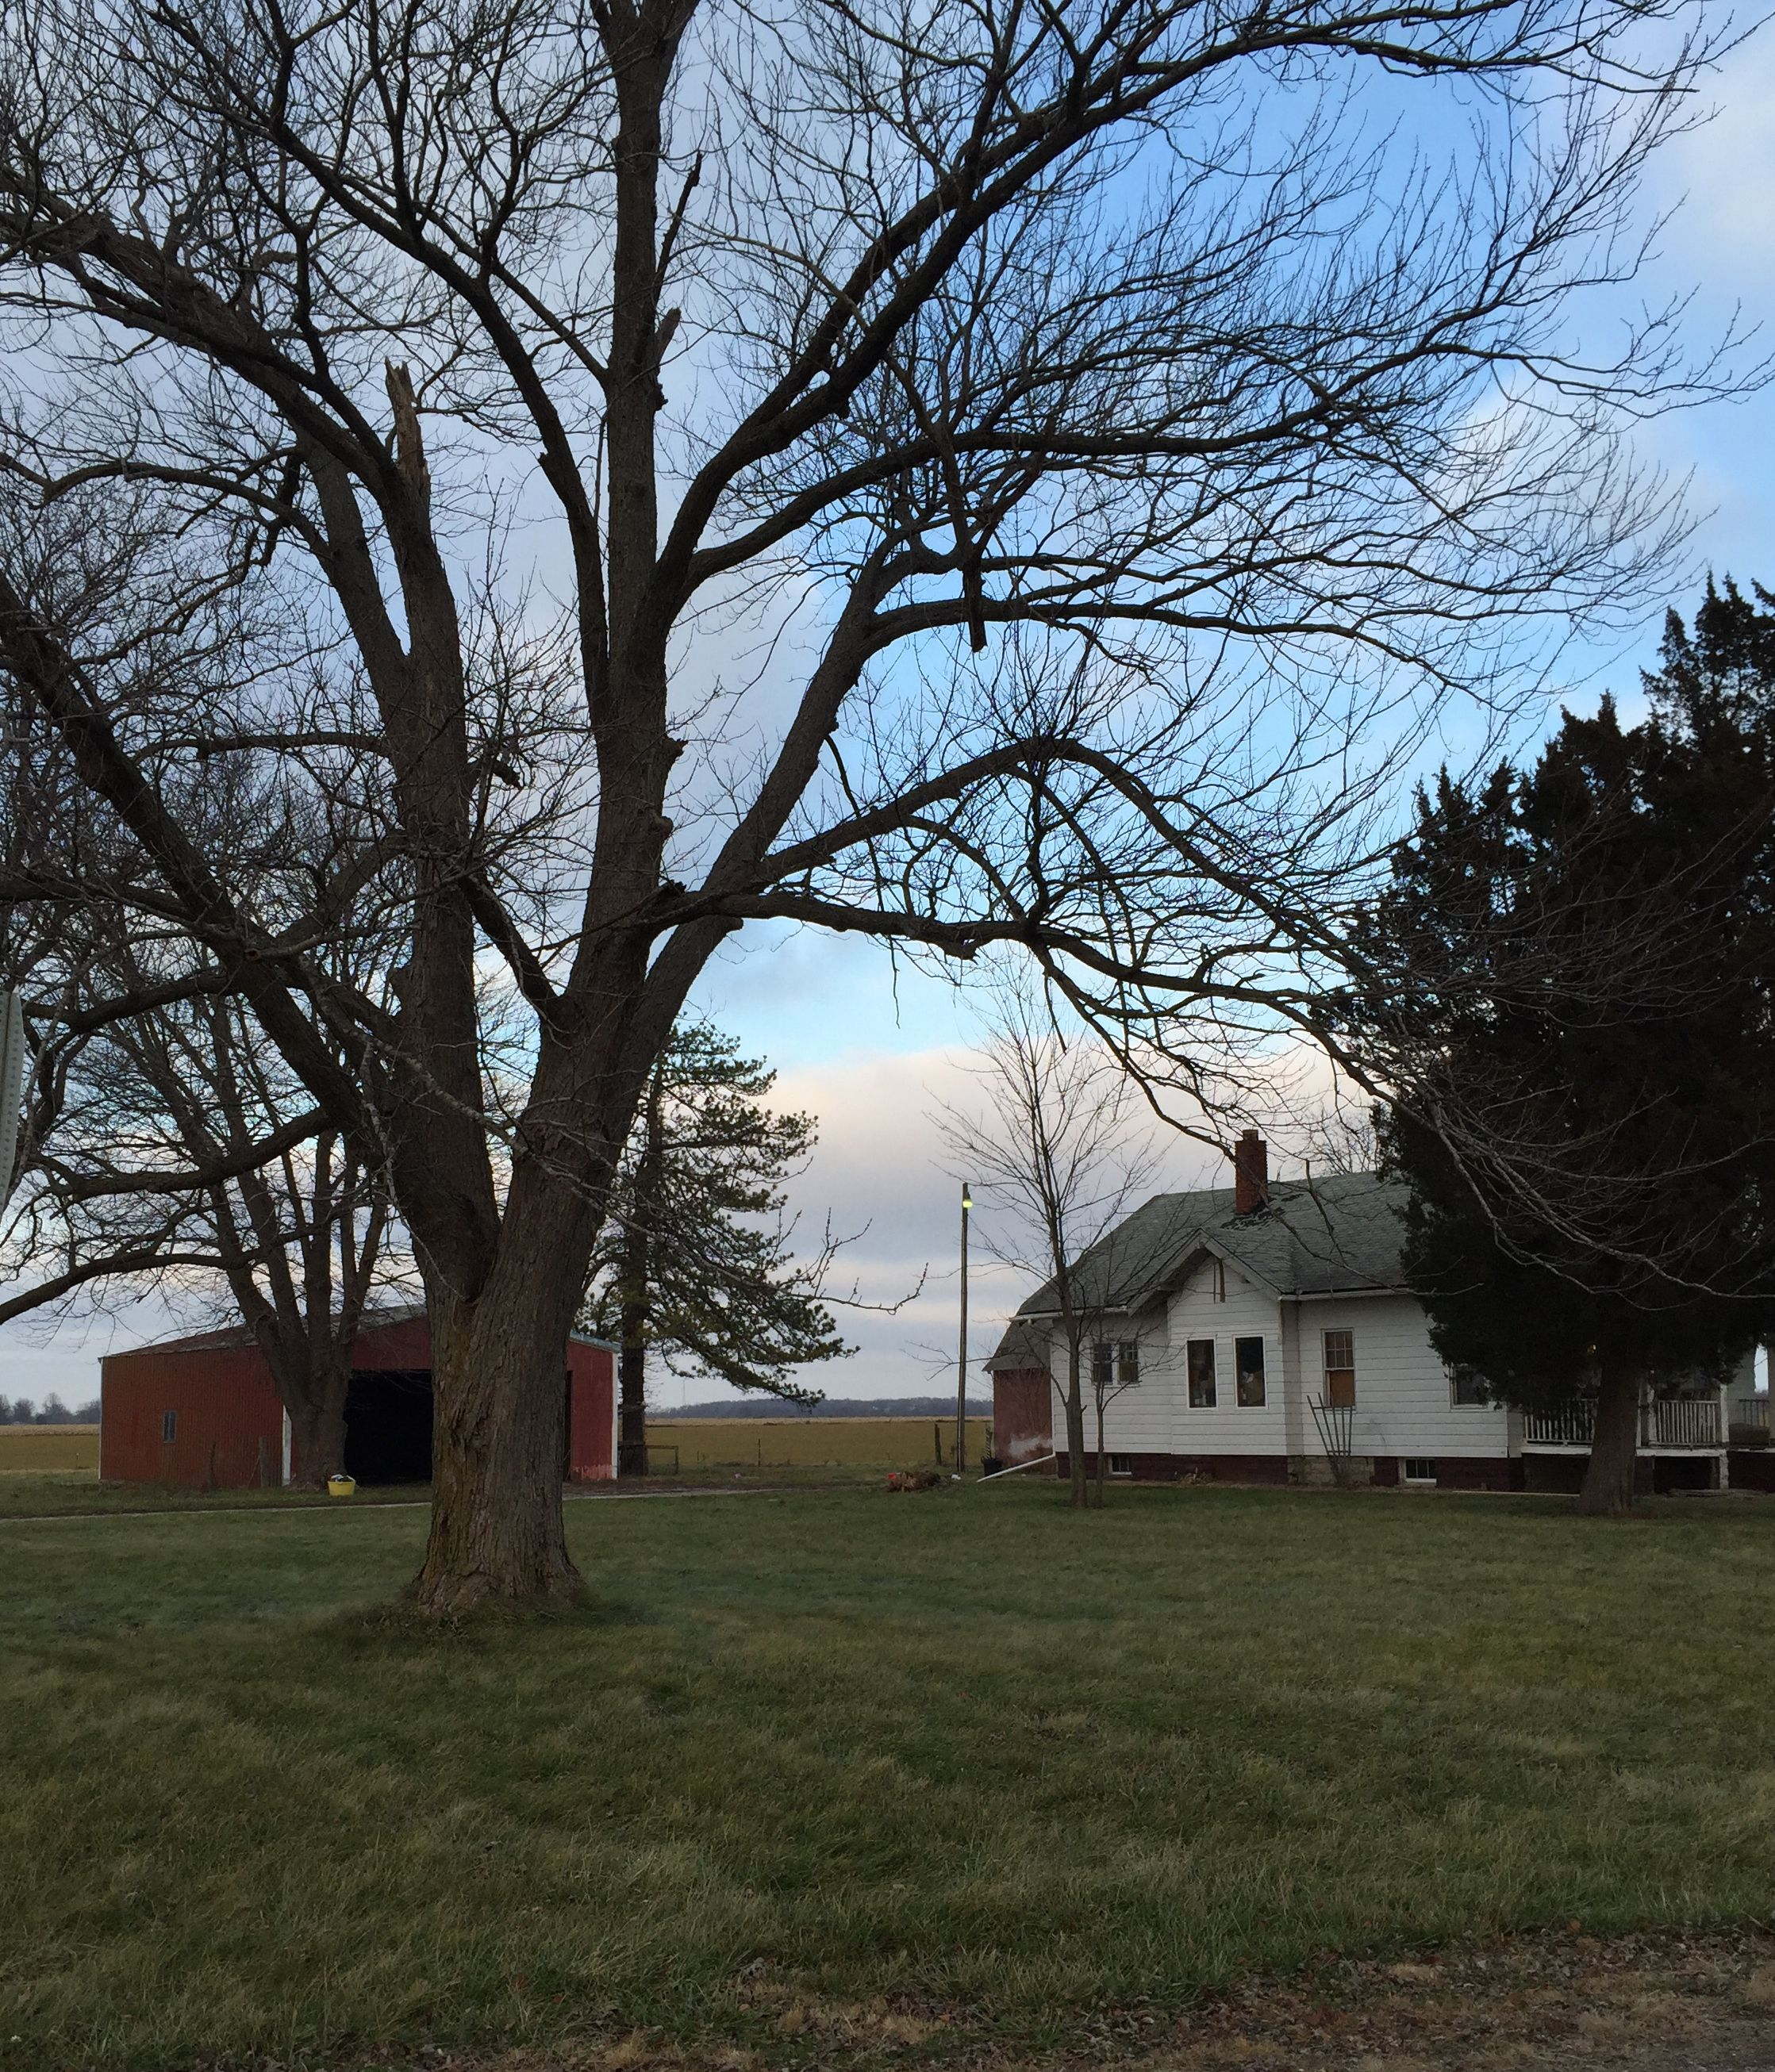 810 E. Oak St., Witt, Illinois 62094